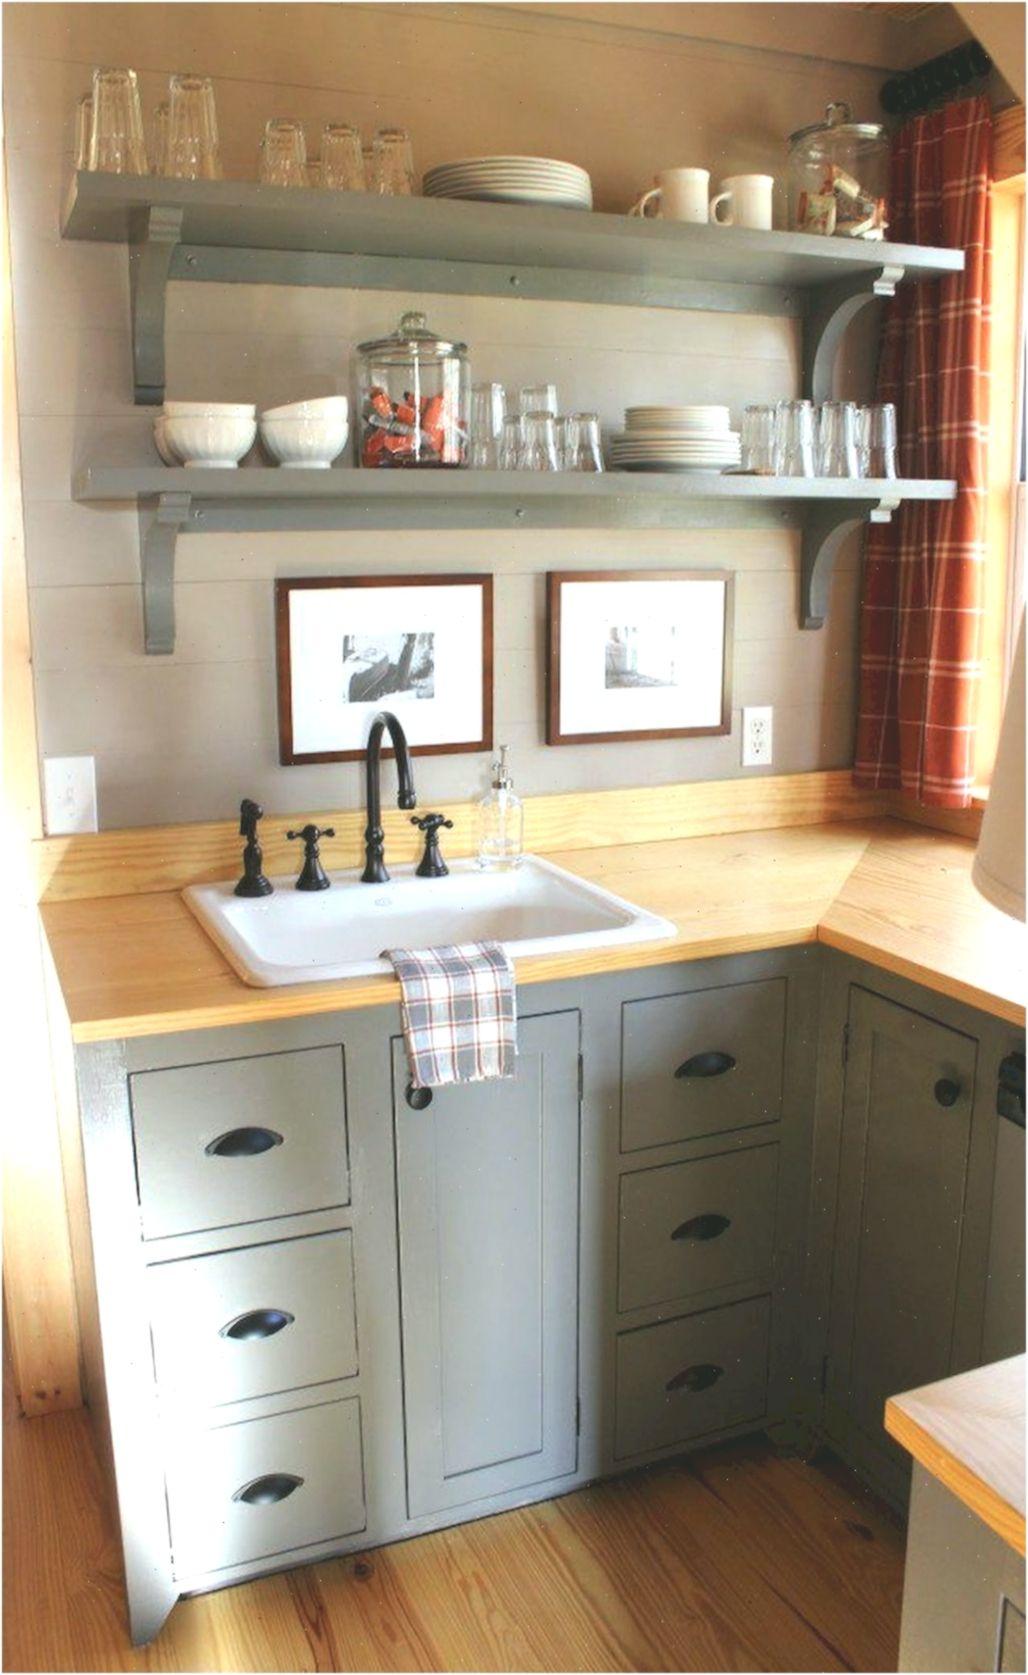 17 amazing tiny house kitchen design ideas in 17  Design, House